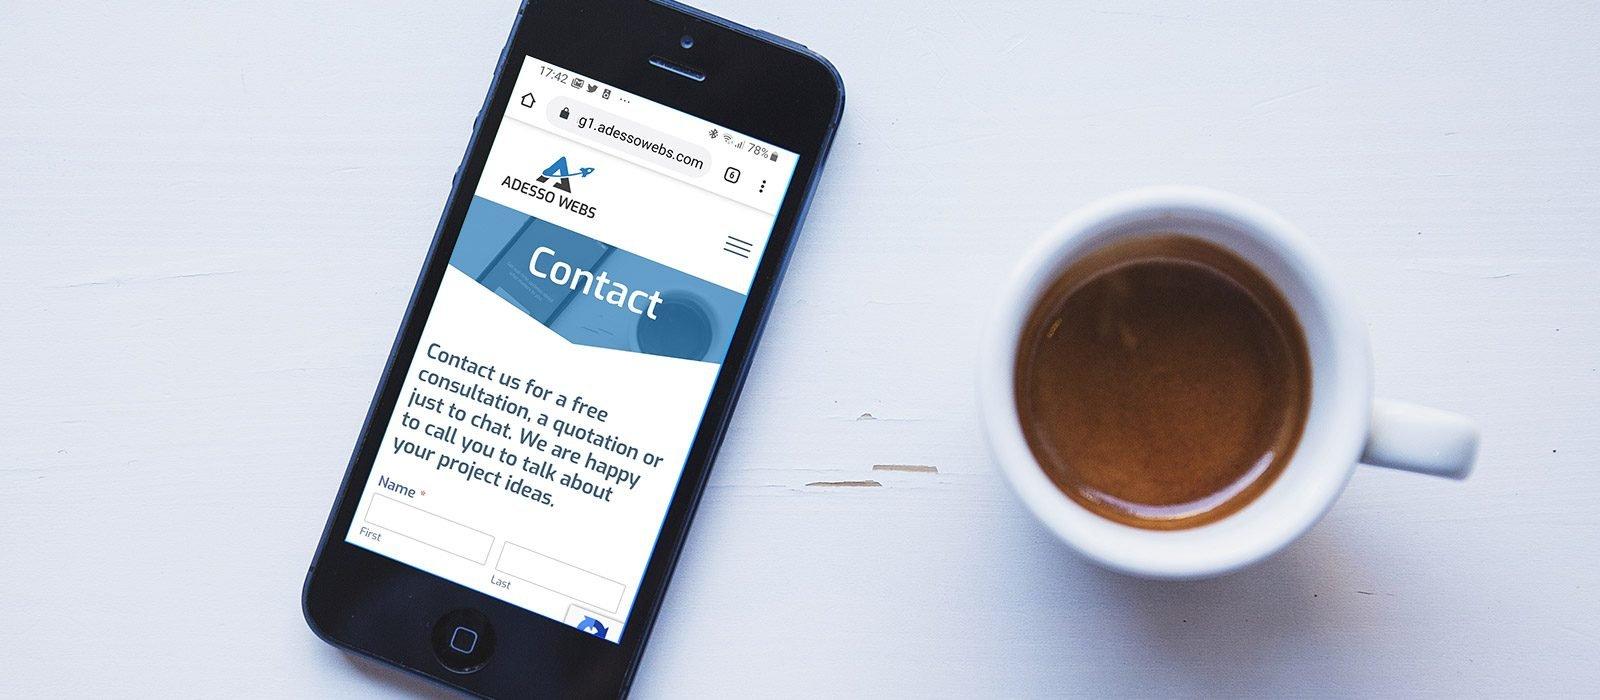 Contact Adessowebs